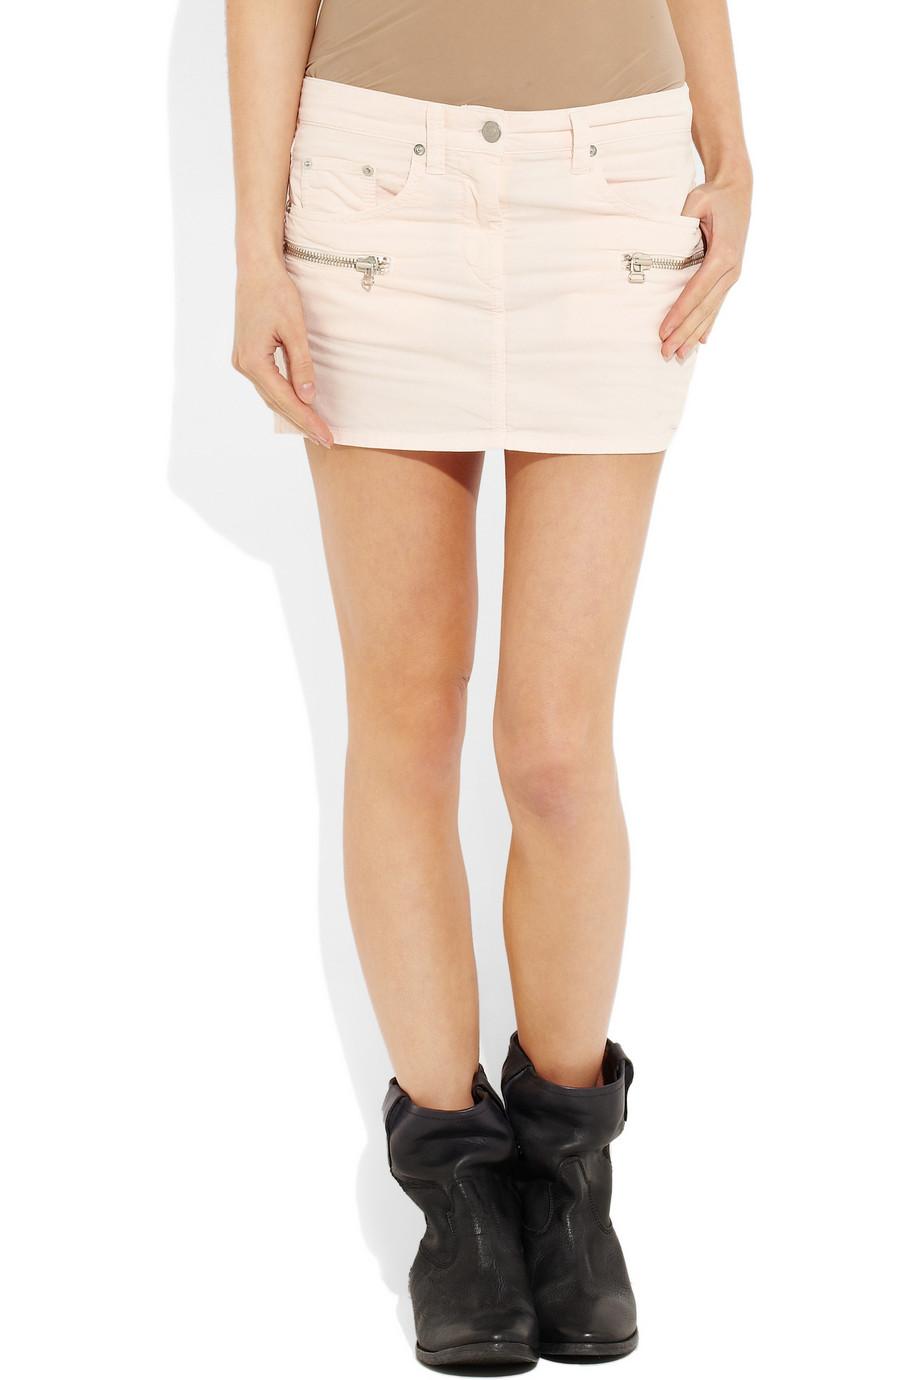 Étoile isabel marant Issop Corduroy Mini Skirt in Pink   Lyst